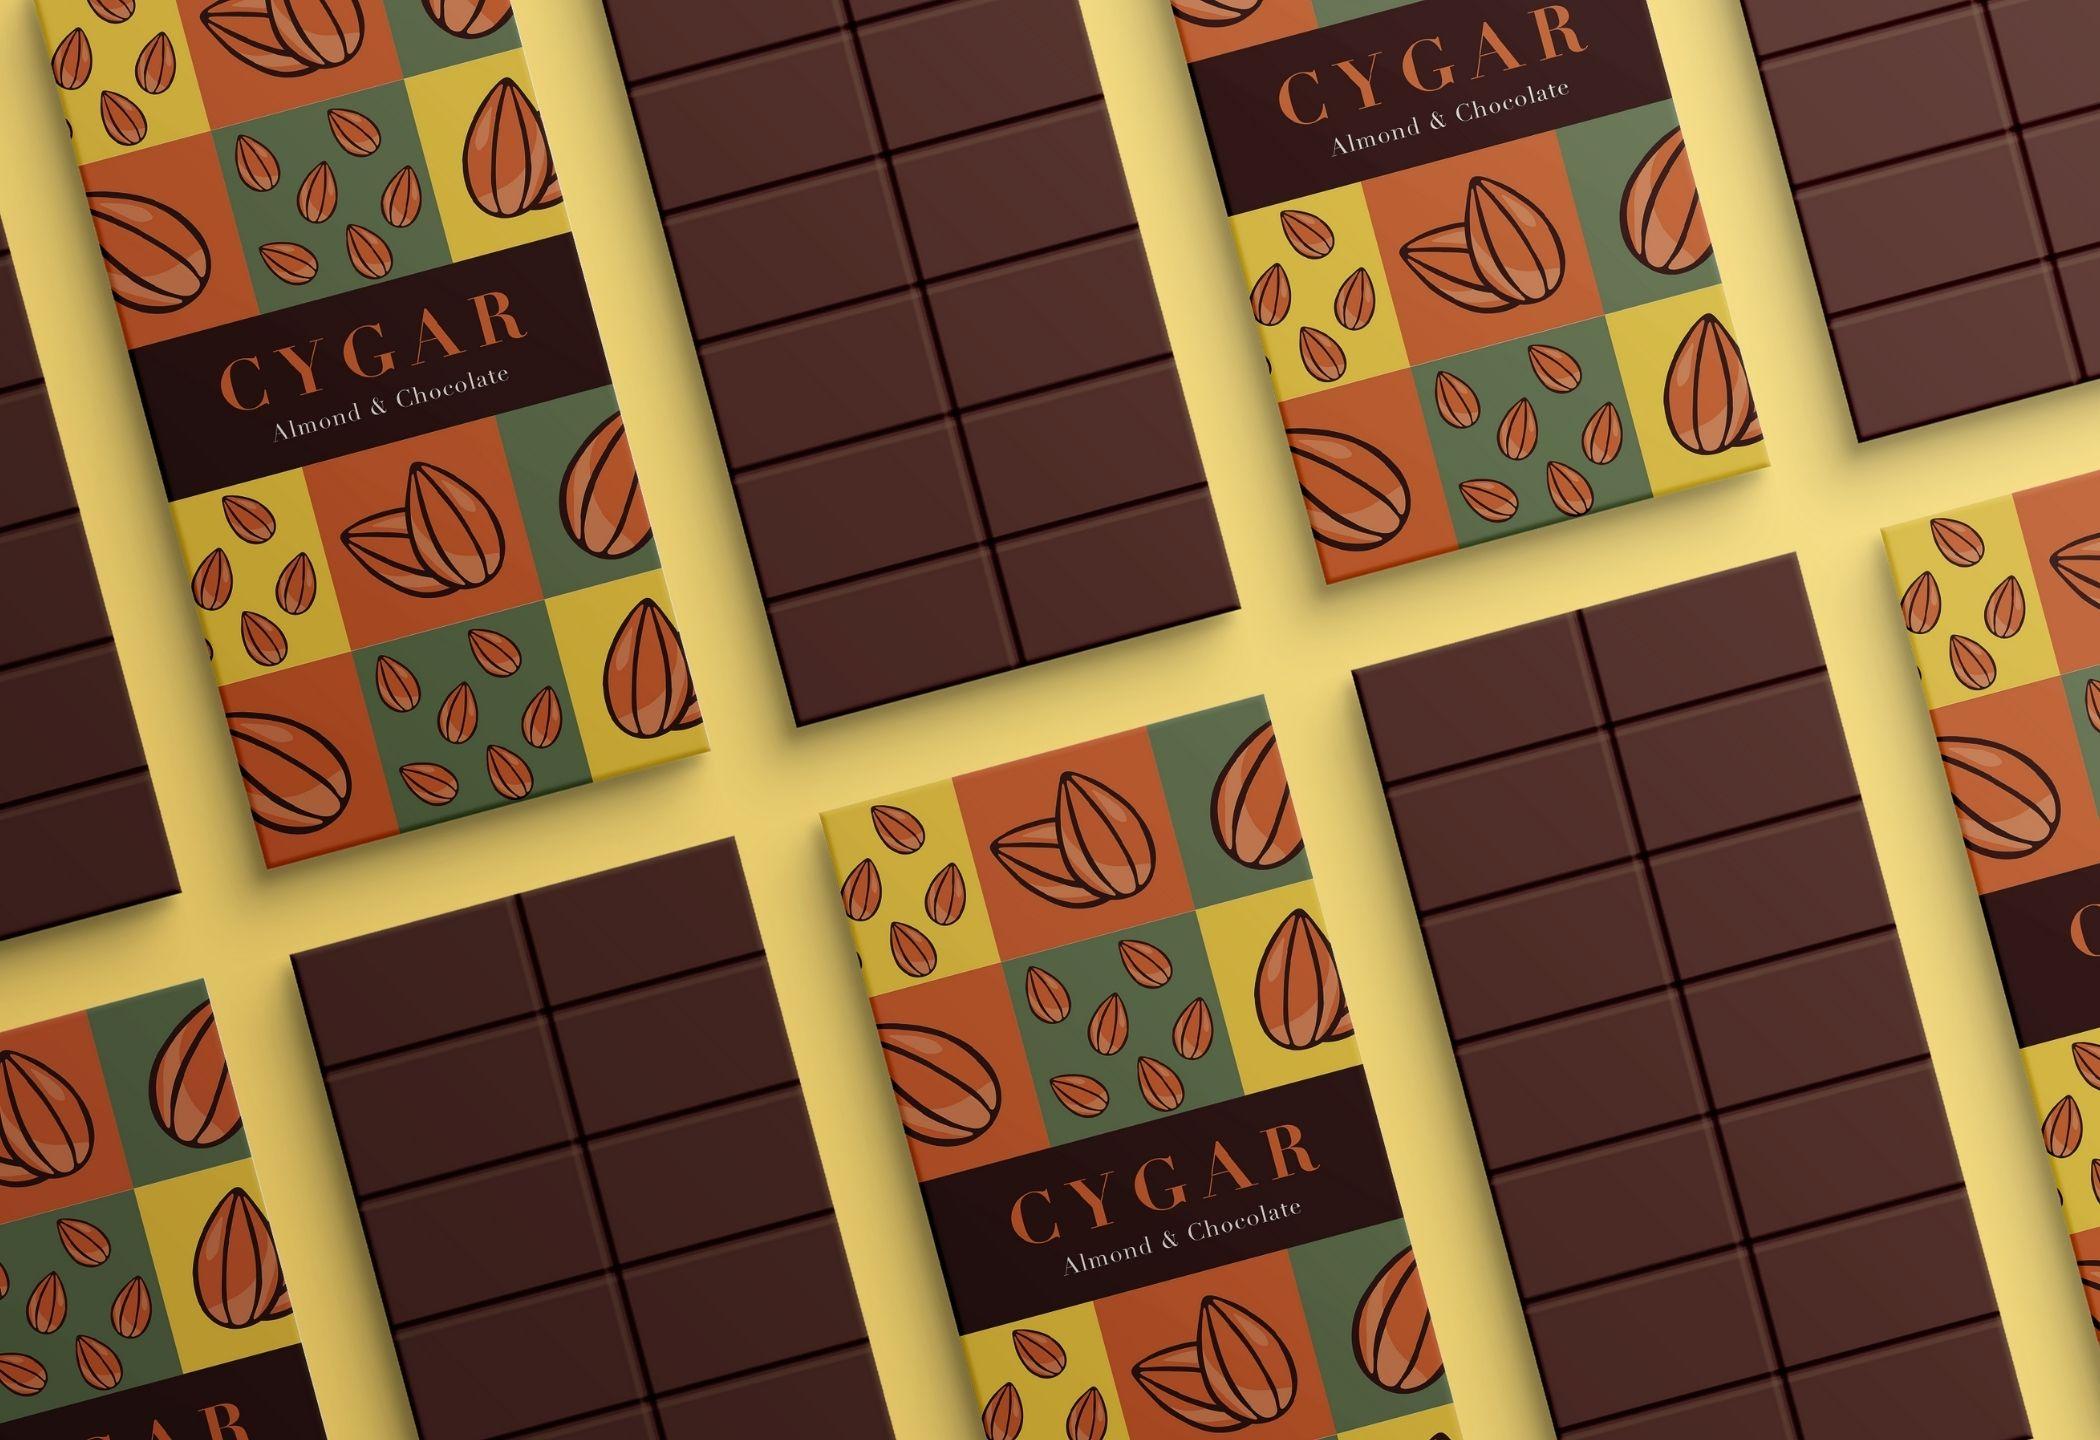 Cygar: 100% Real Chocolaty Goodness